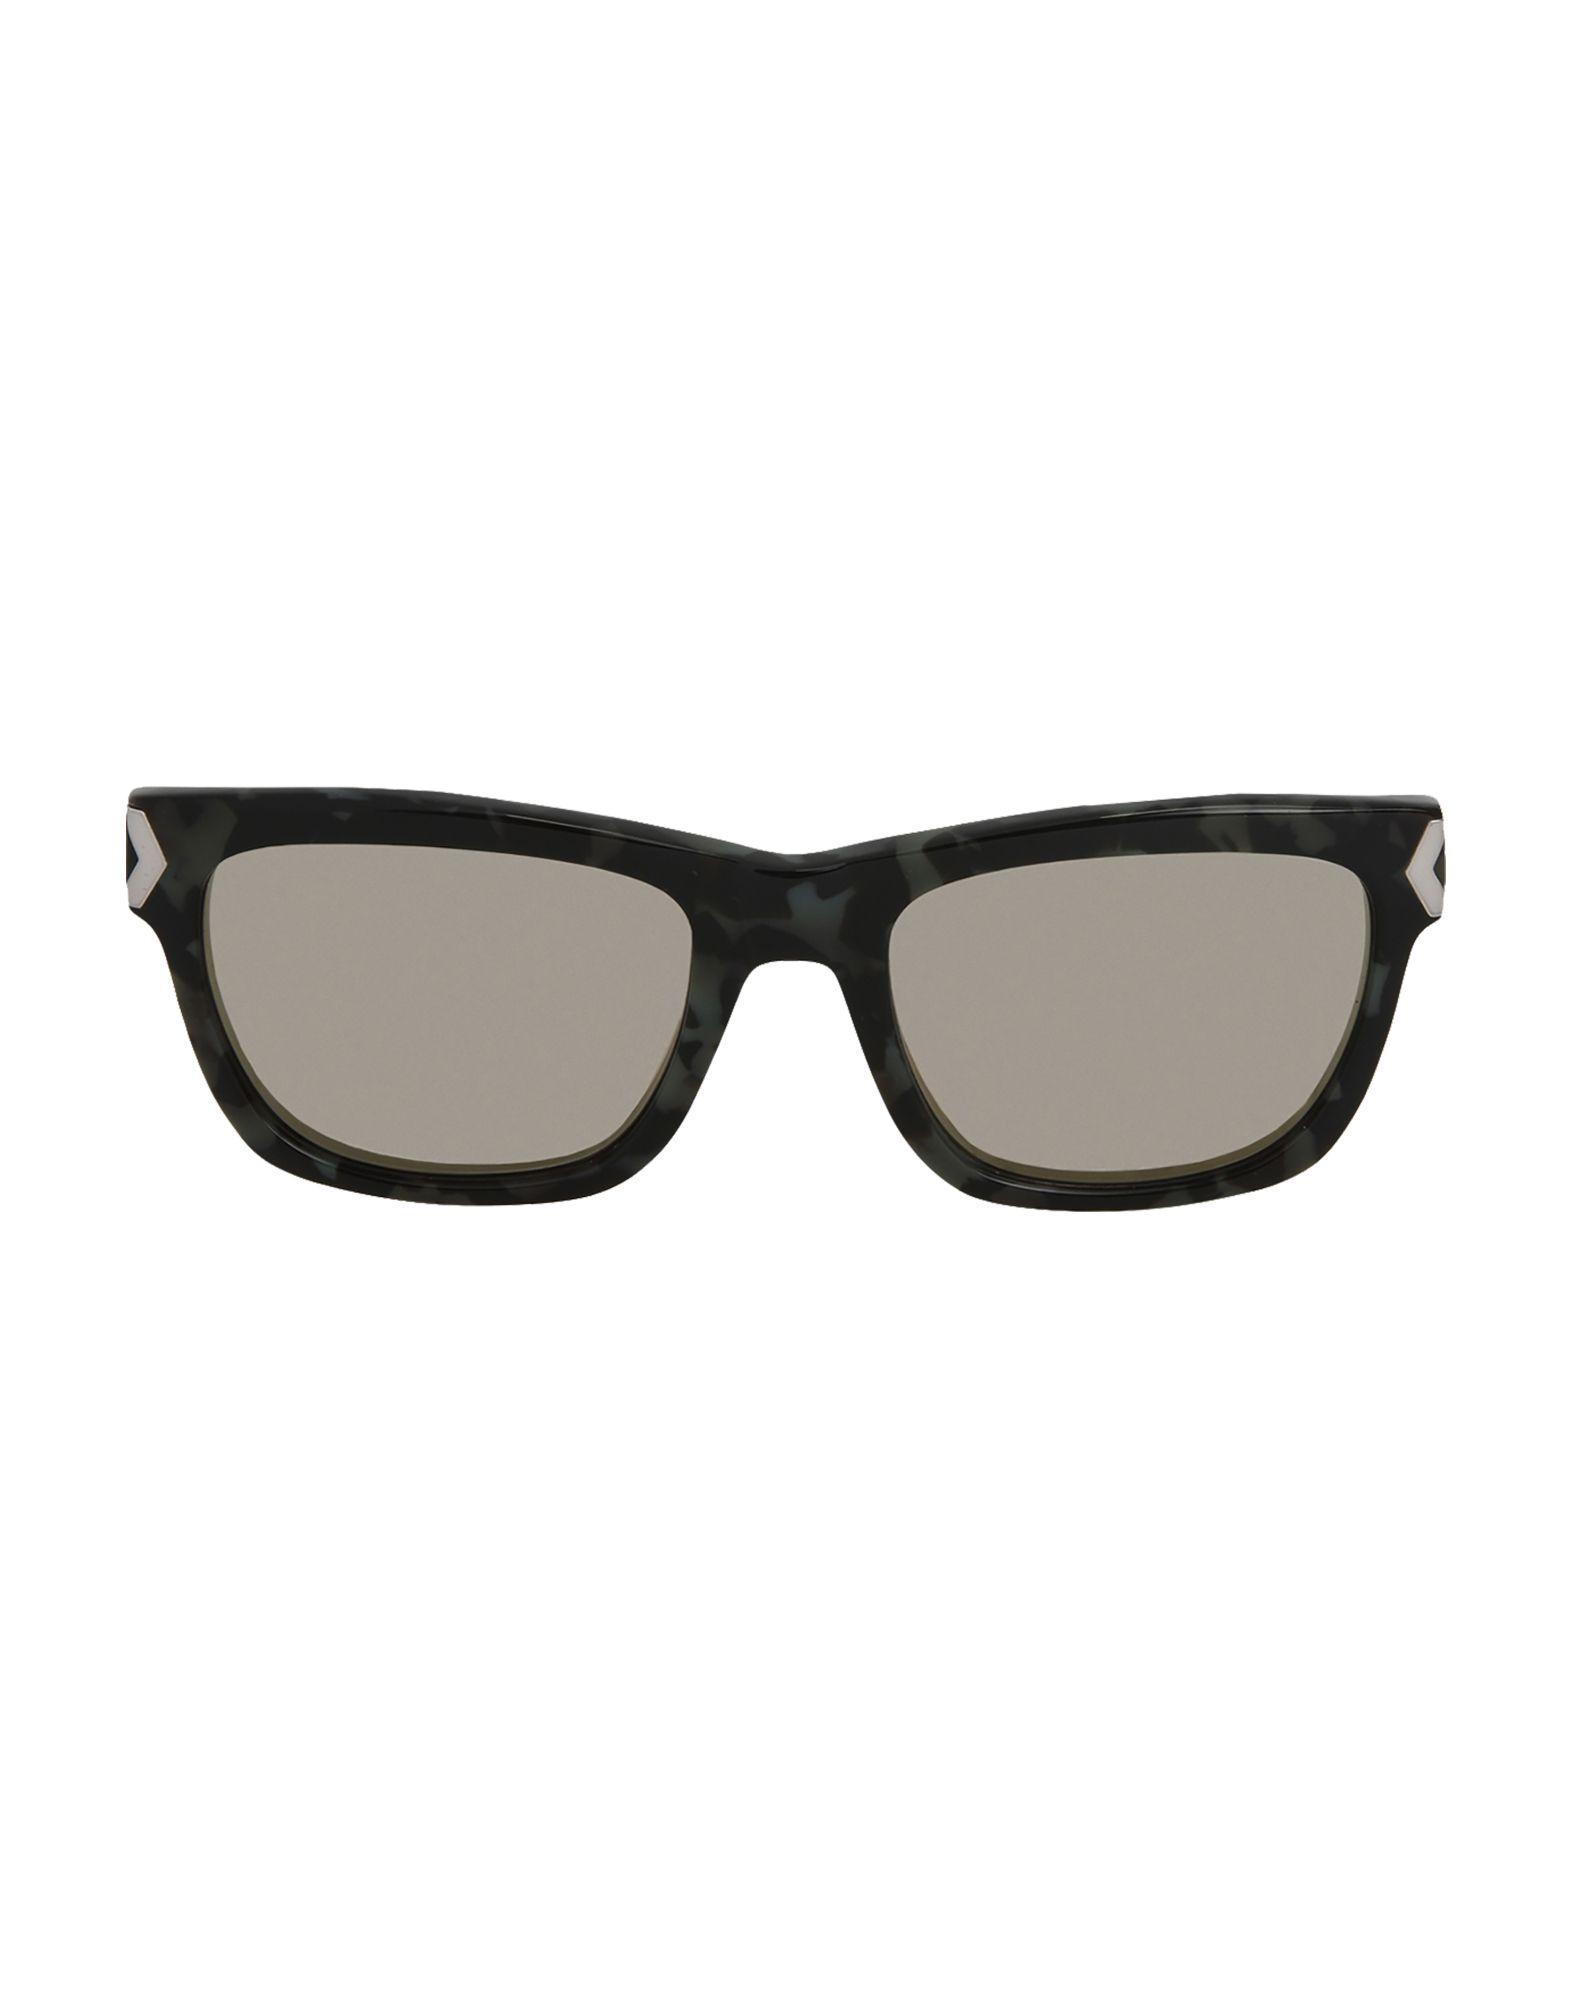 JUST CAVALLI Солнечные очки just cavalli солнцезащитные очки jc 640s 89с